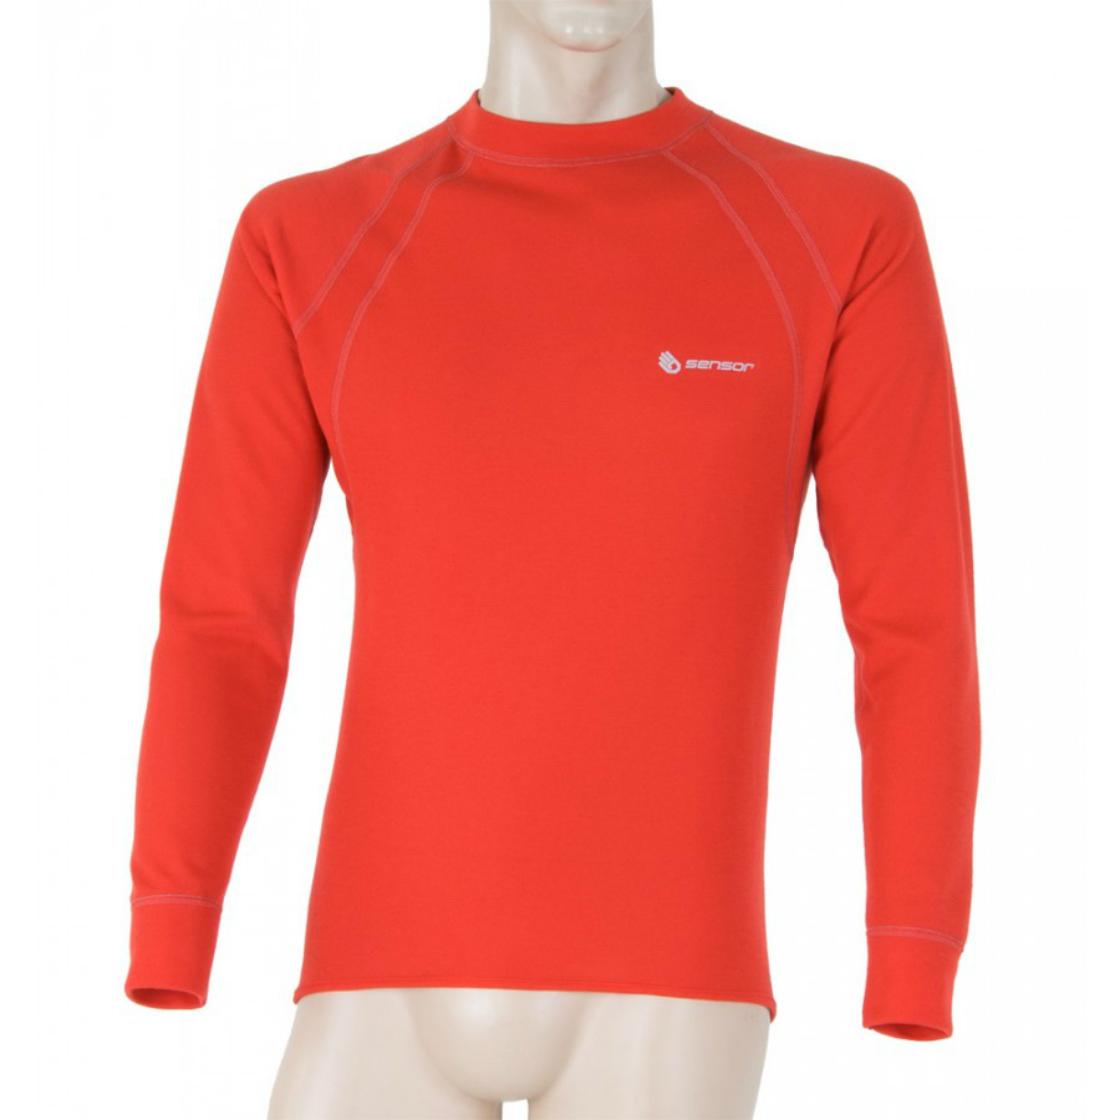 8f3f62ae6ebe pánske Sensor Double Face termo T-shirt red - Sensor double face termo  tričko červené dlhý rukáv